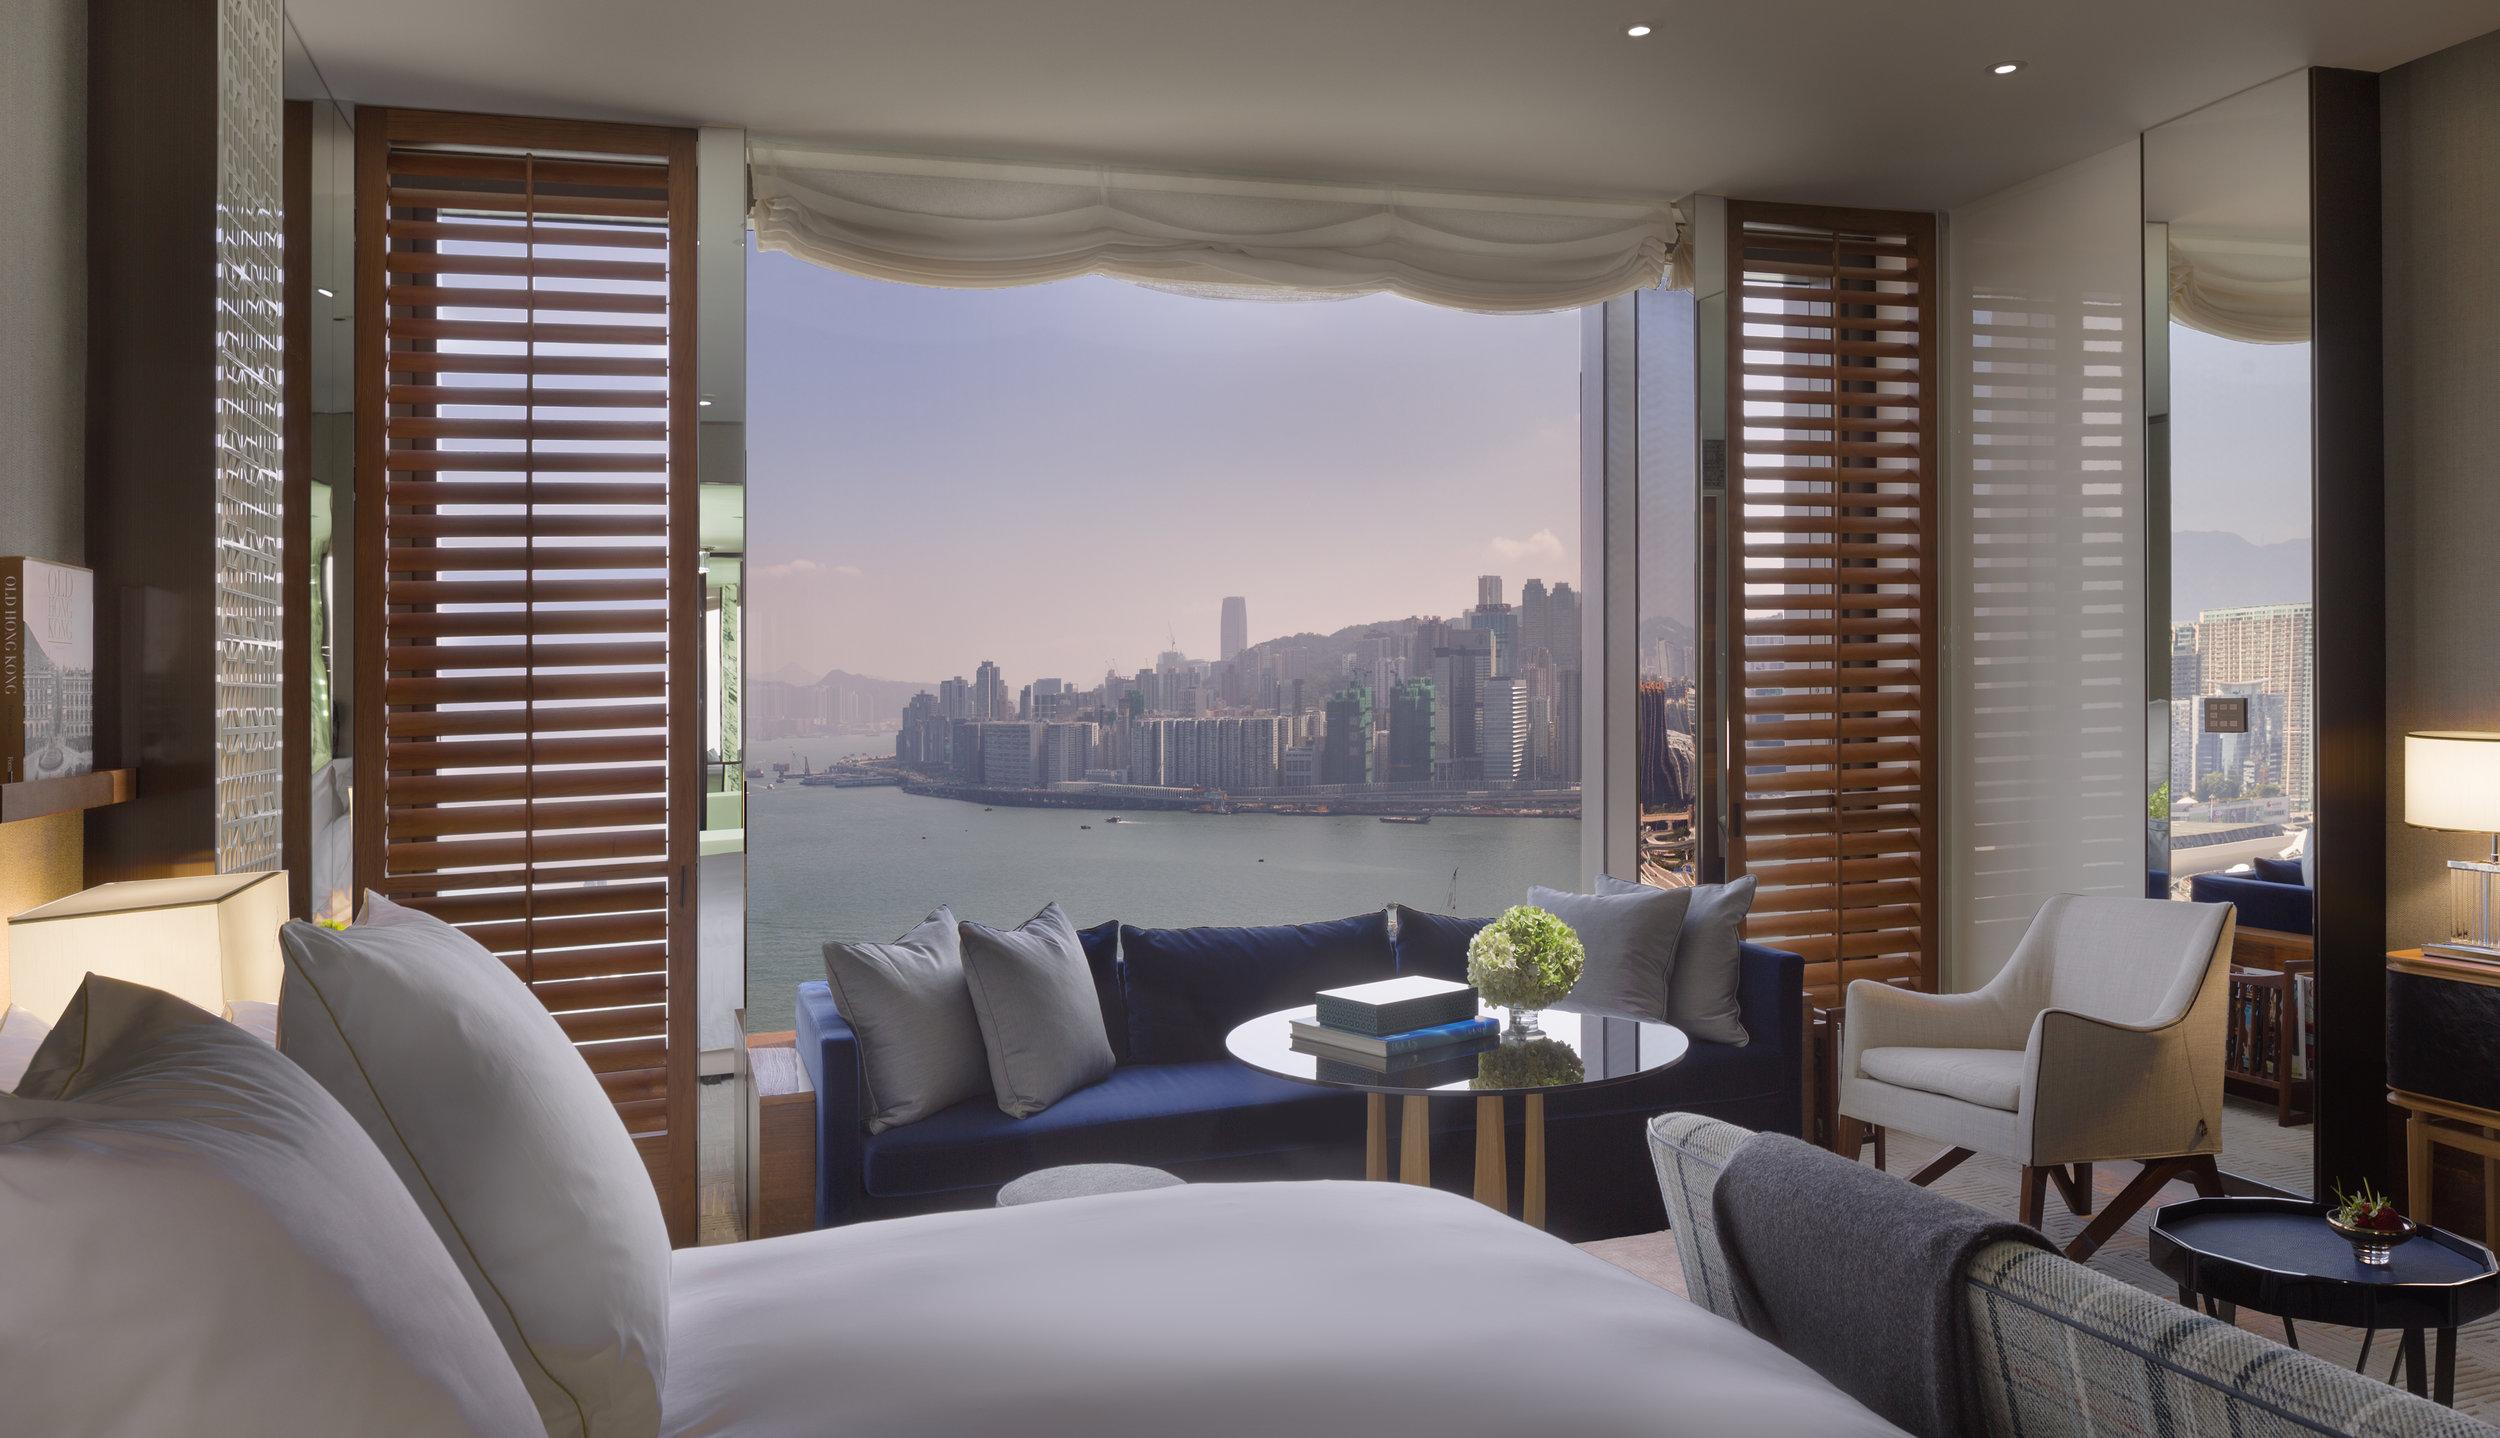 HKG_107533376_RWHKG_Harbour_View_Room_(Daylight).jpg